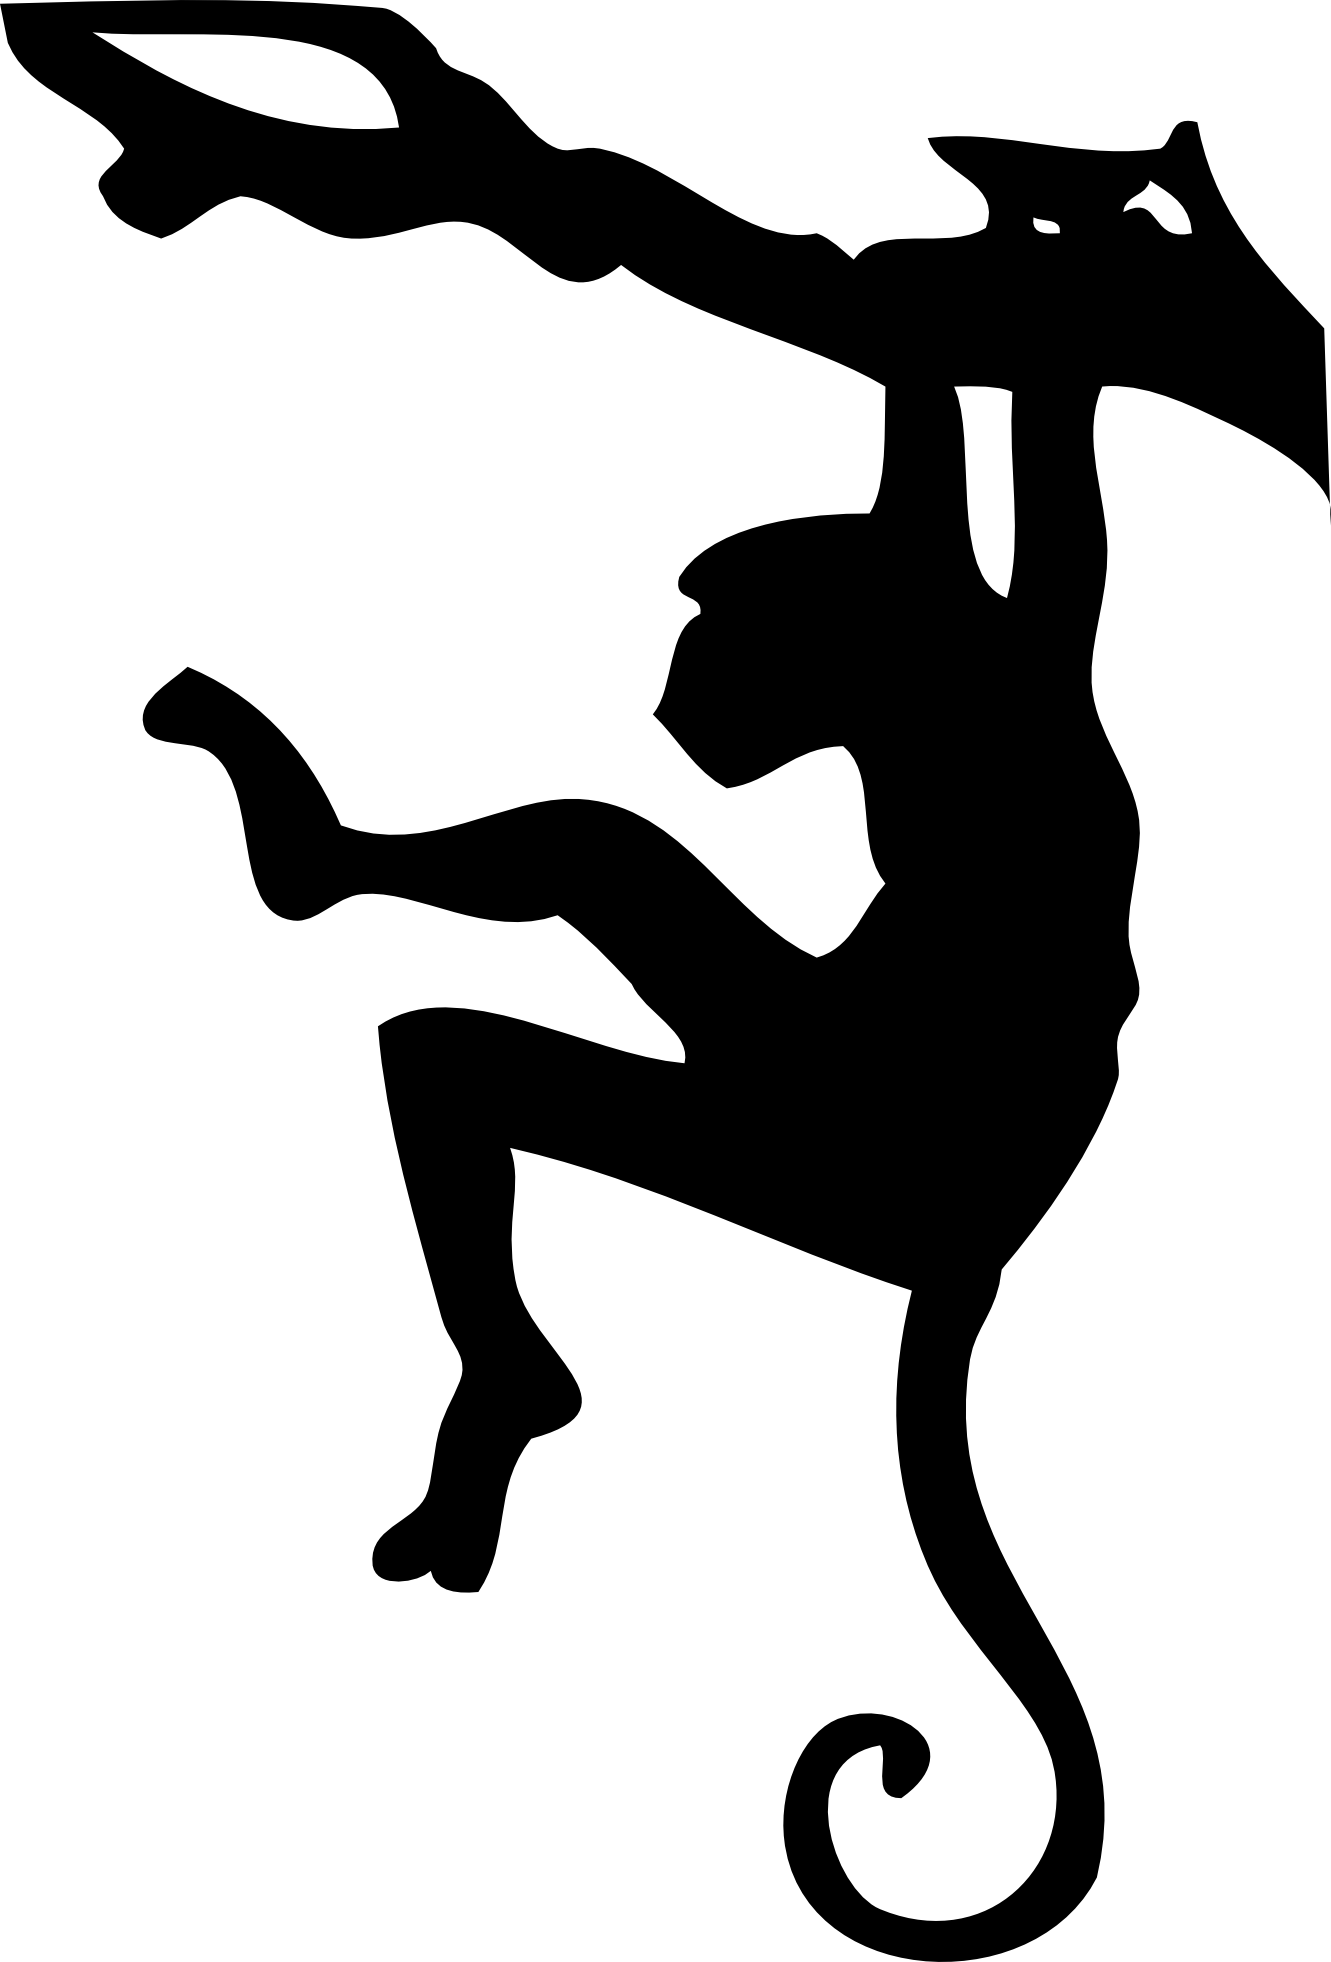 Monkey black and white. Clipart face orangutan